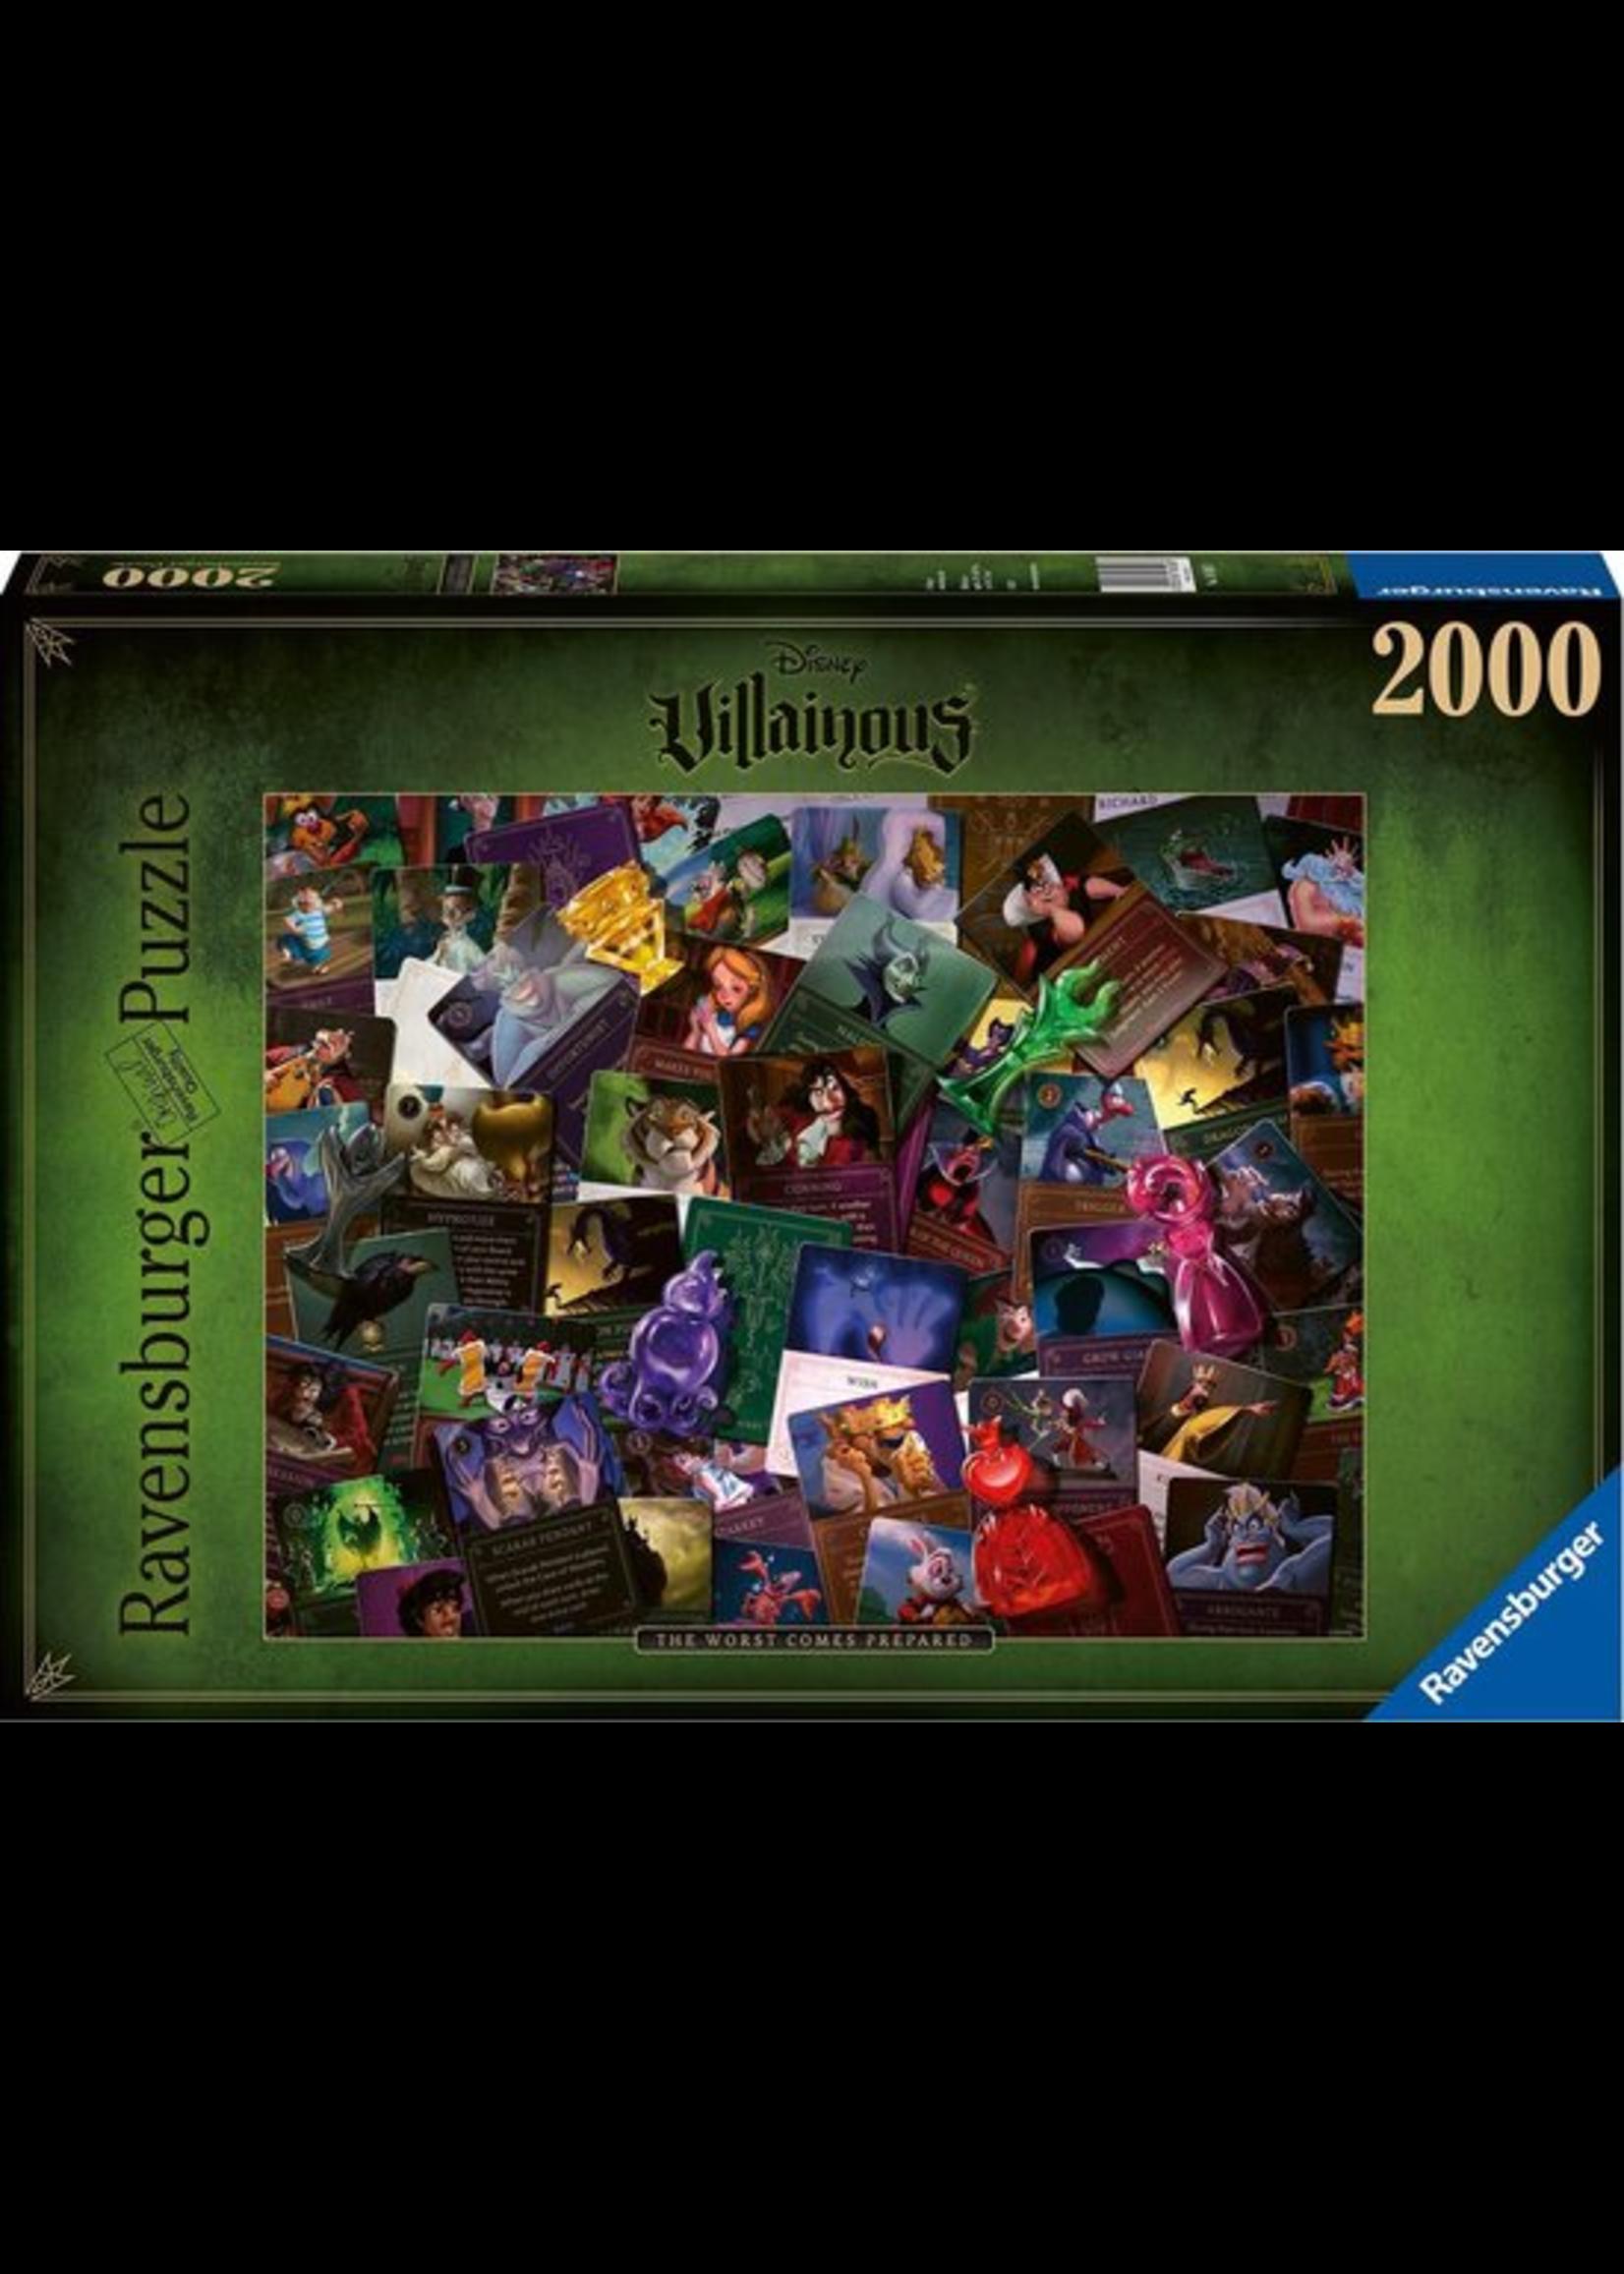 Disney Villainous - All Villains (2000)